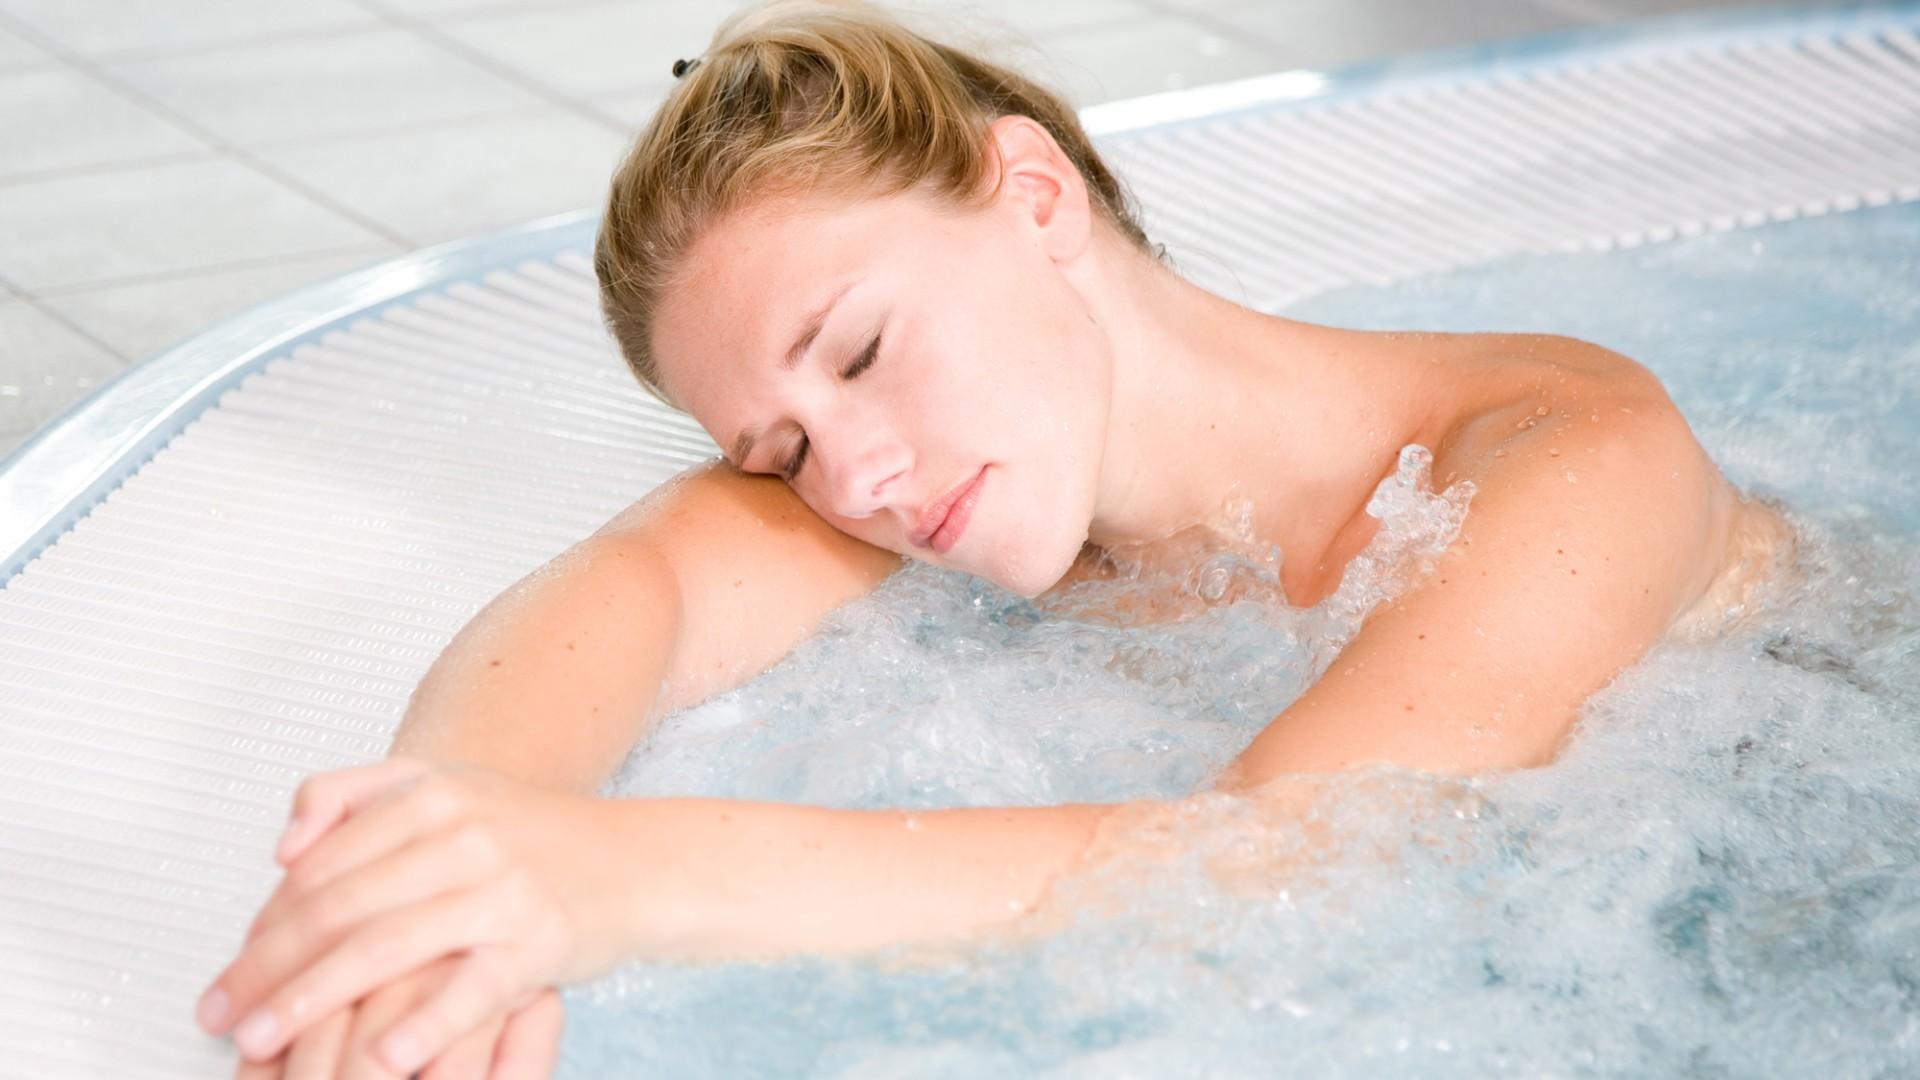 000 masaje relax relajacion balneario fisioterapia  (3)